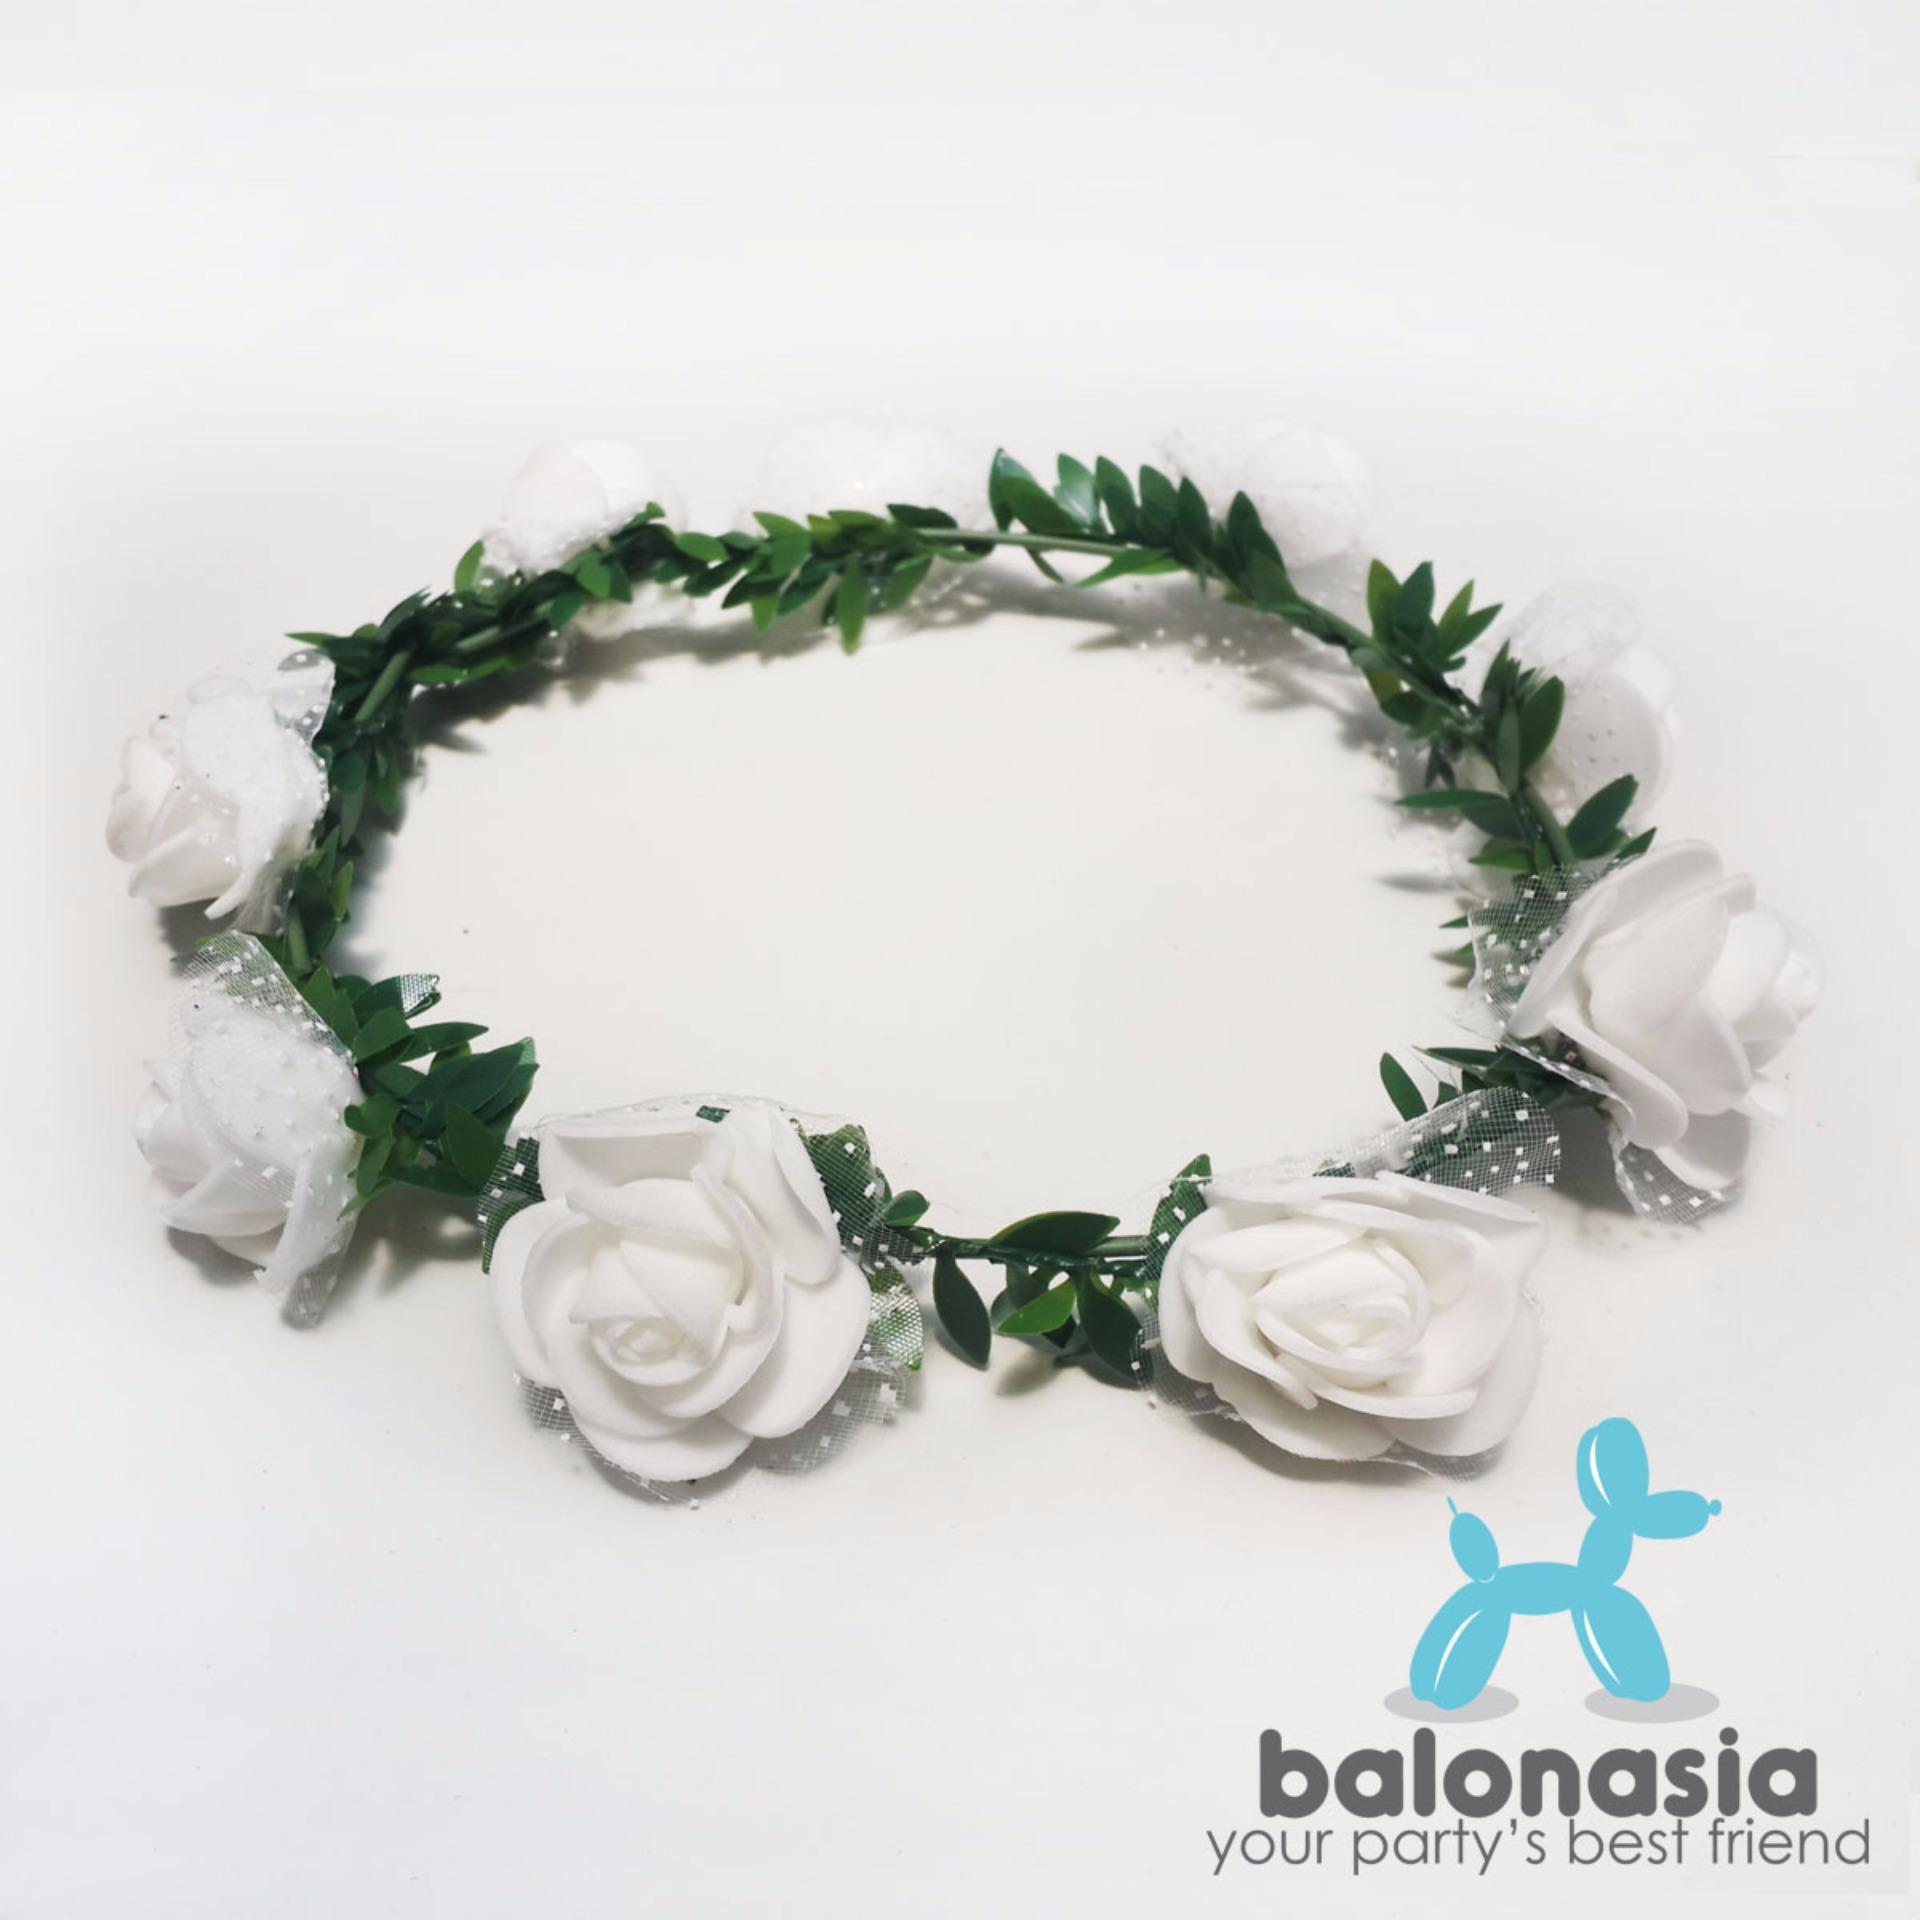 Beli diskon balonasia flower crown aksesoris pesta mahkota bunga balonasia flower crown aksesoris pesta mahkota bunga putih izmirmasajfo